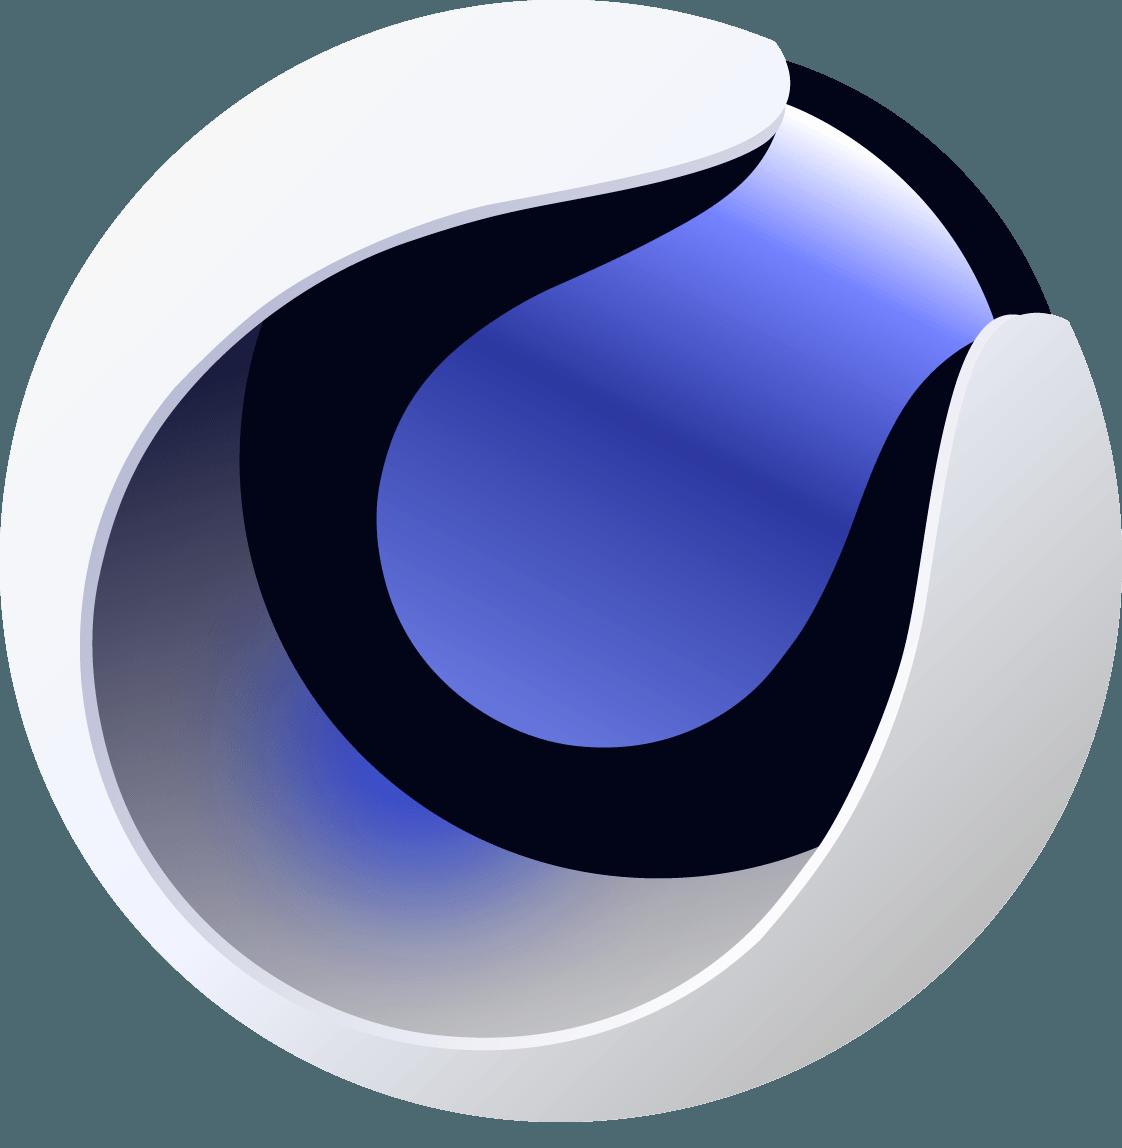 Cinema 4D Logo [Maxon] Vector Icon Template Clipart Free ...  Cinema 4D Logo ...